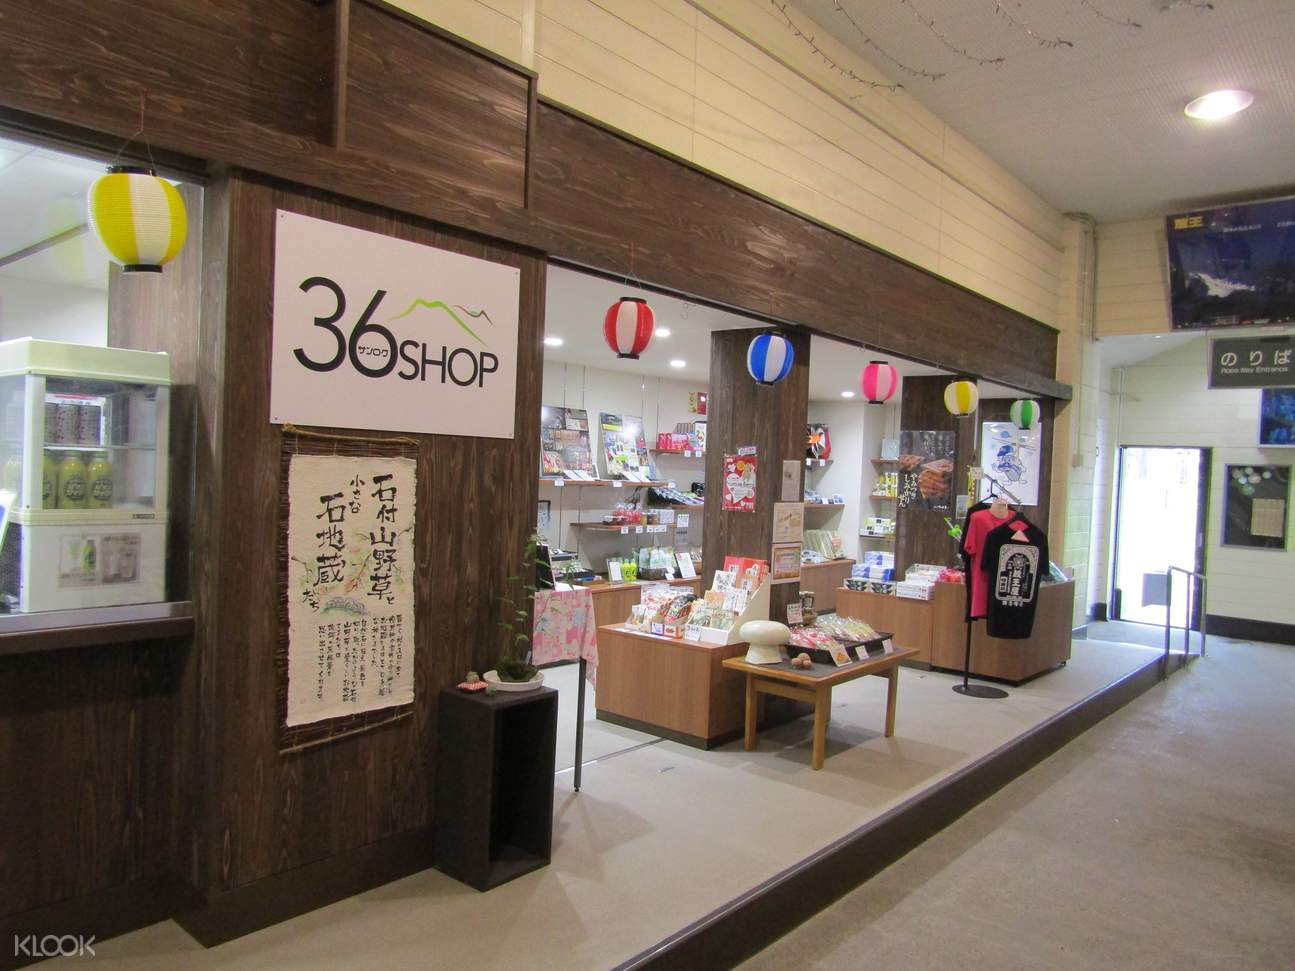 Zao Ropeway Round Trip Ticket Souvenir Shop